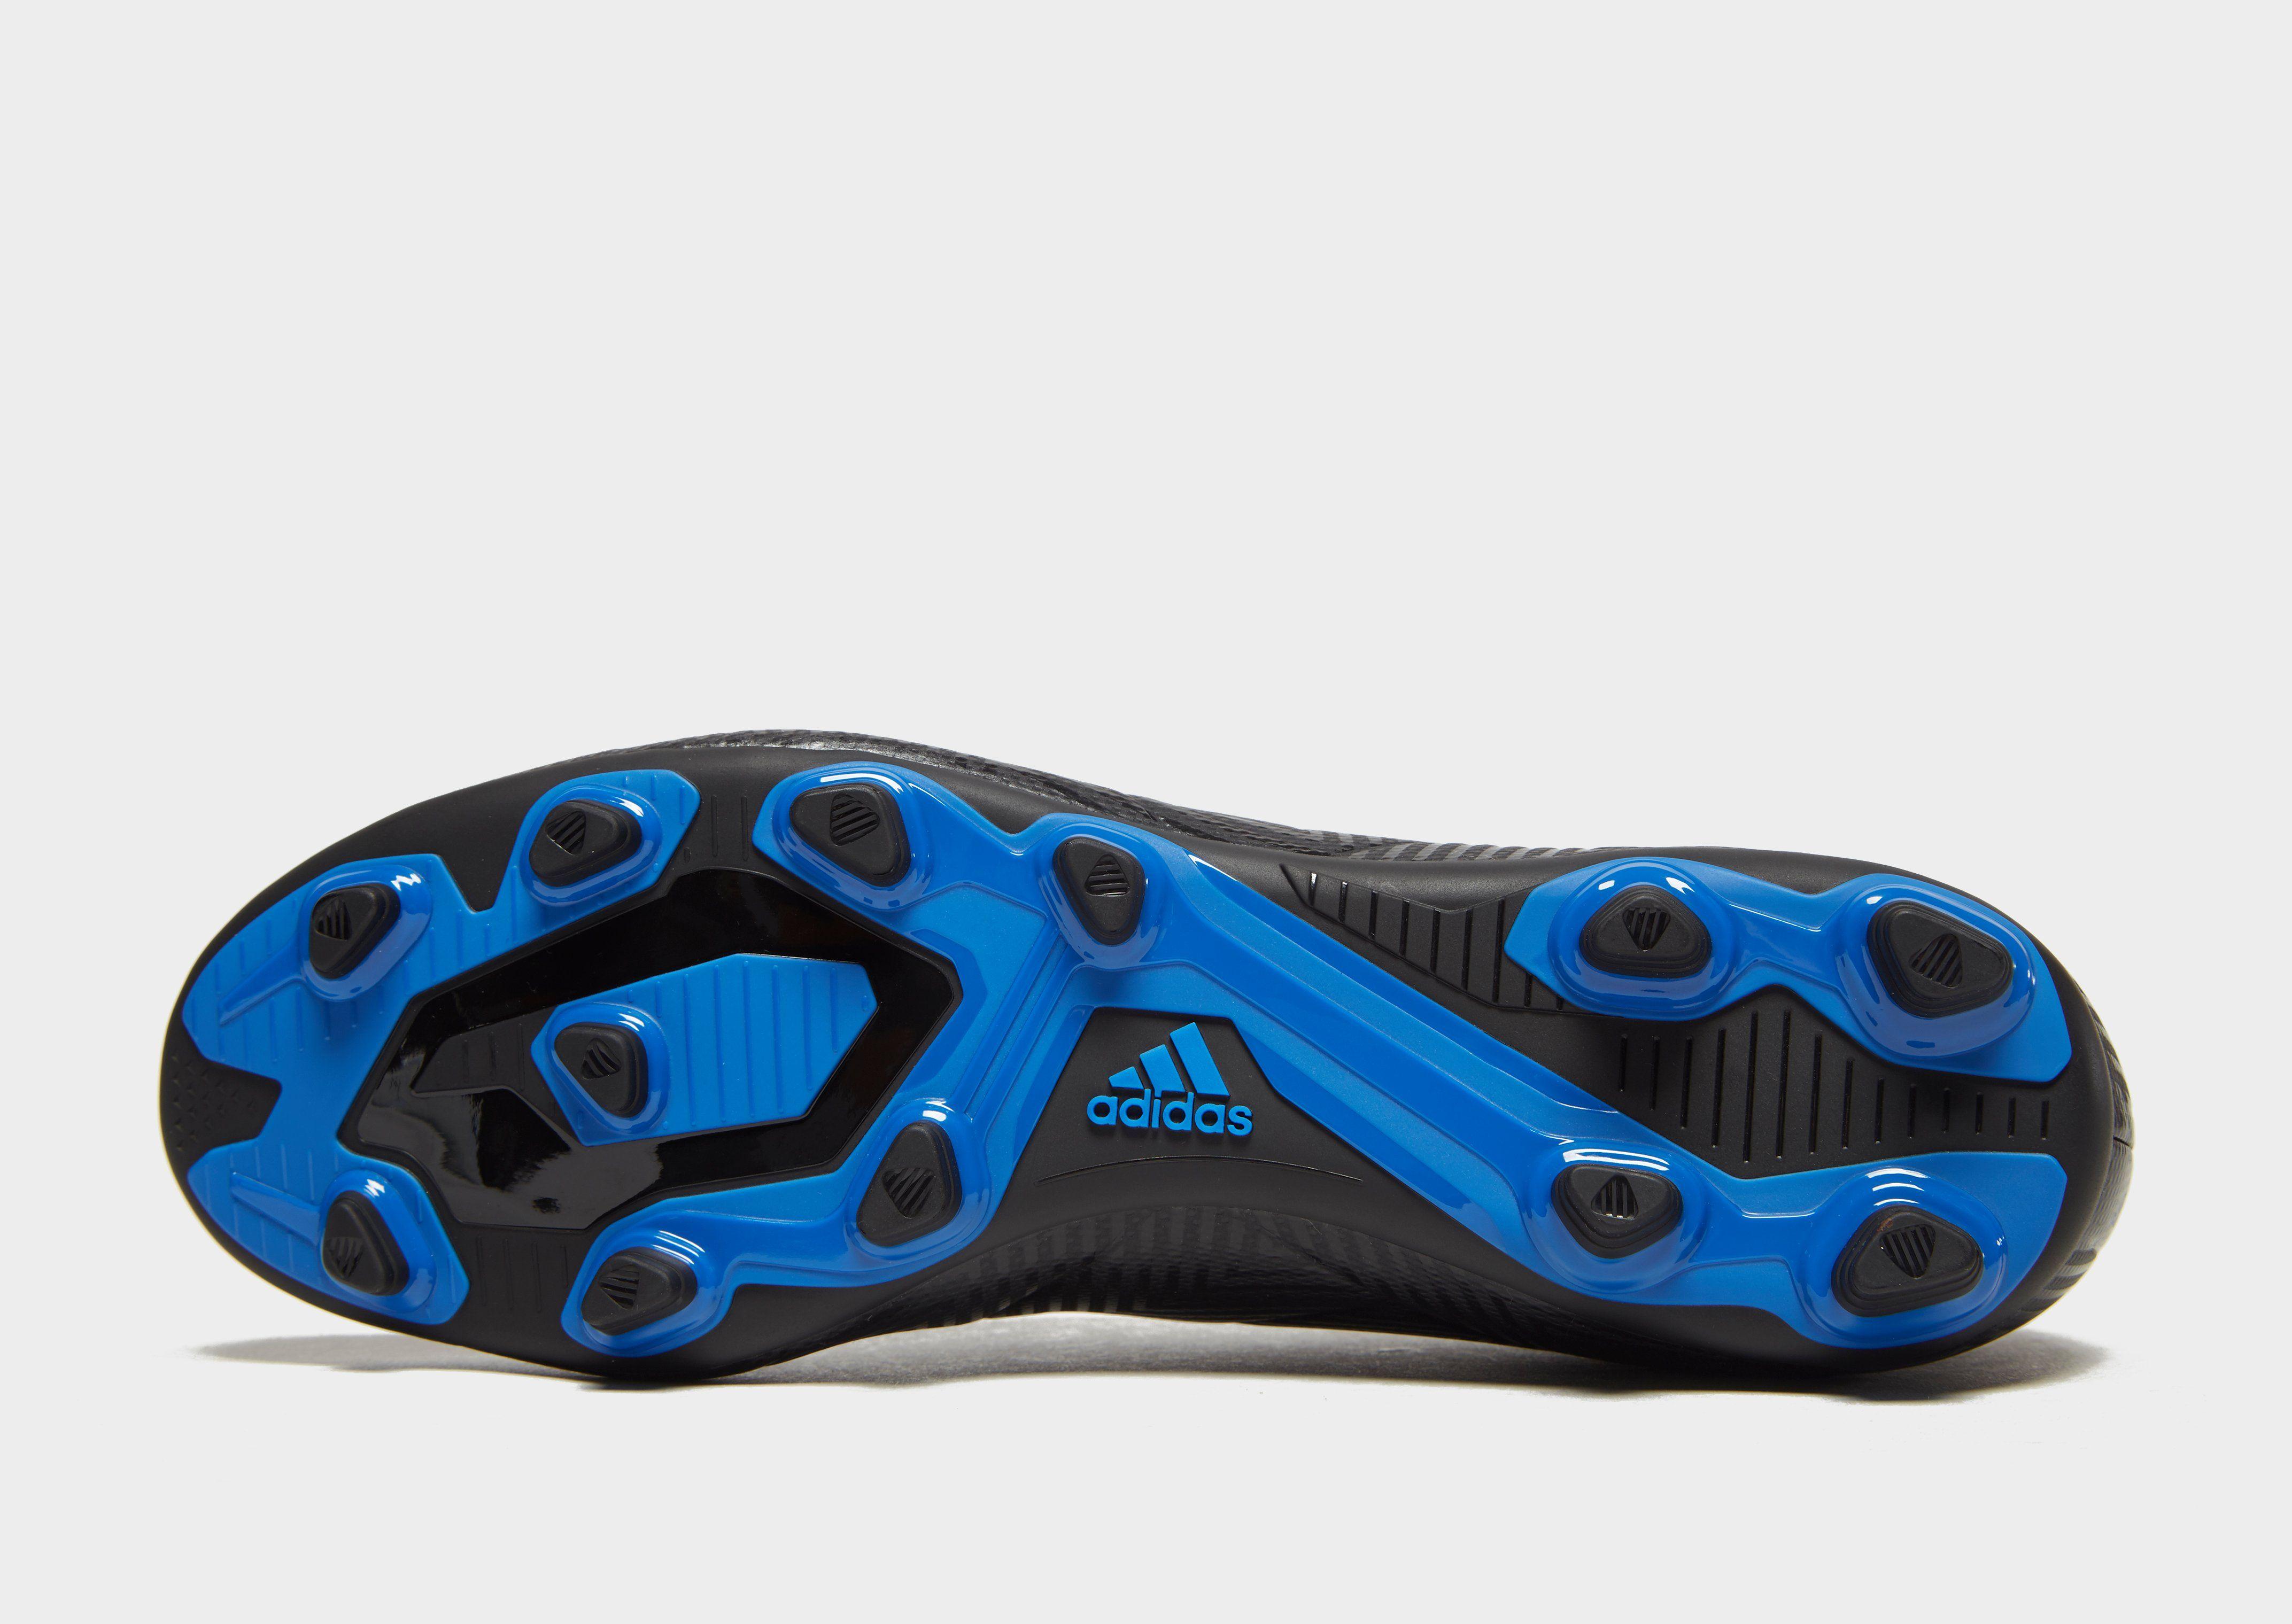 adidas Archetic Nemeziz 18.4 FG